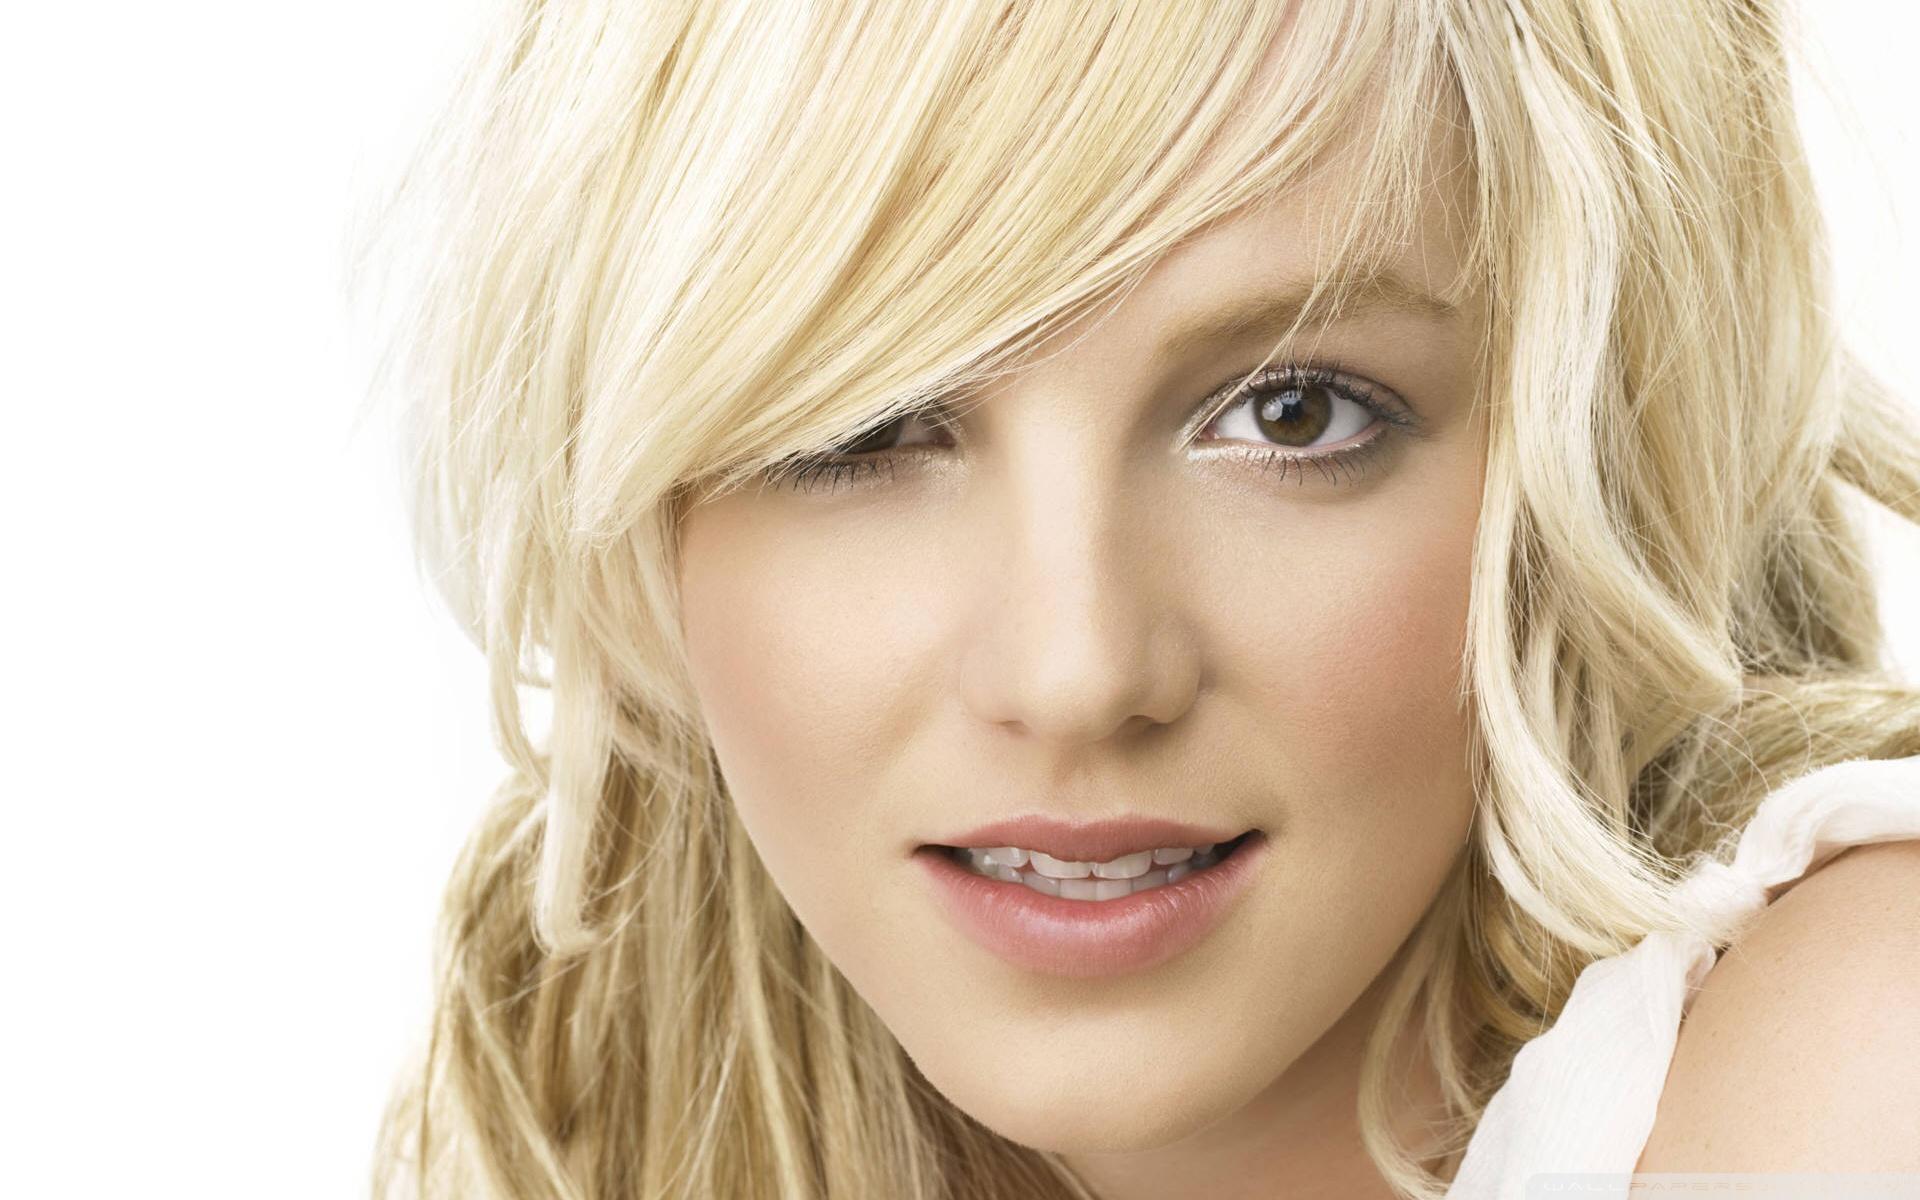 Britney Spears Wallpaper 35